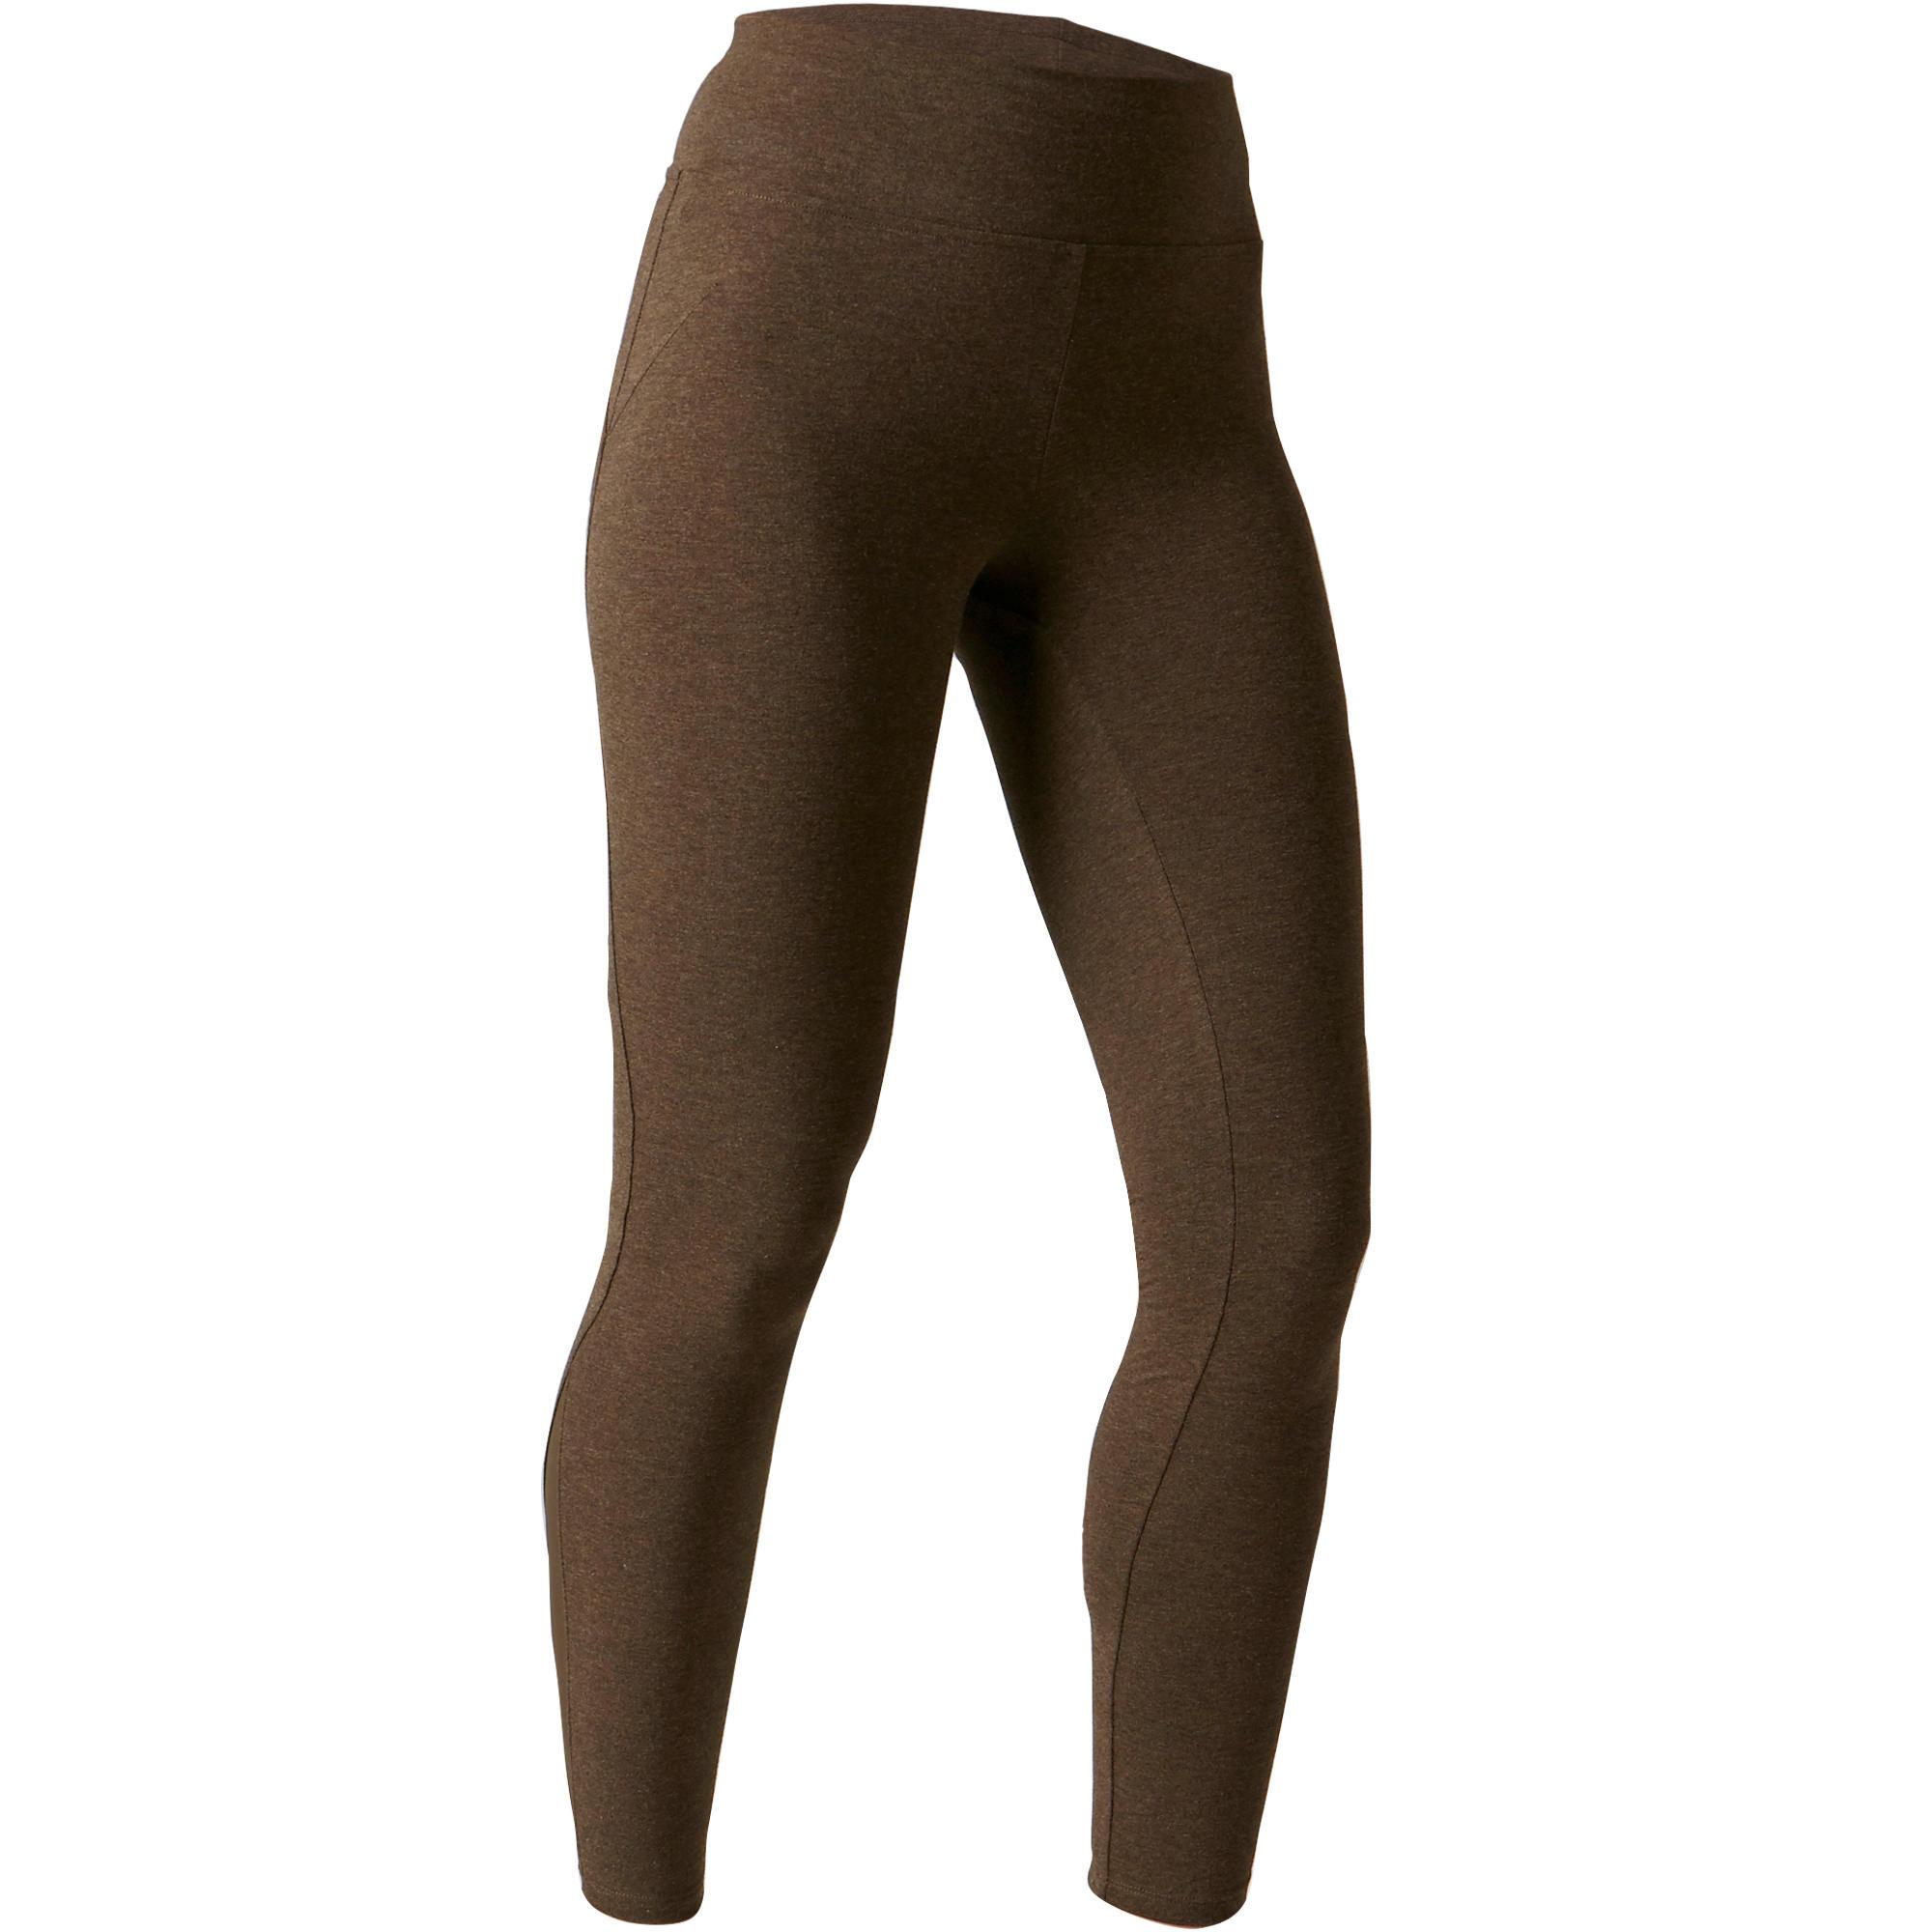 Legging 520 slim Gym étirements femme kaki